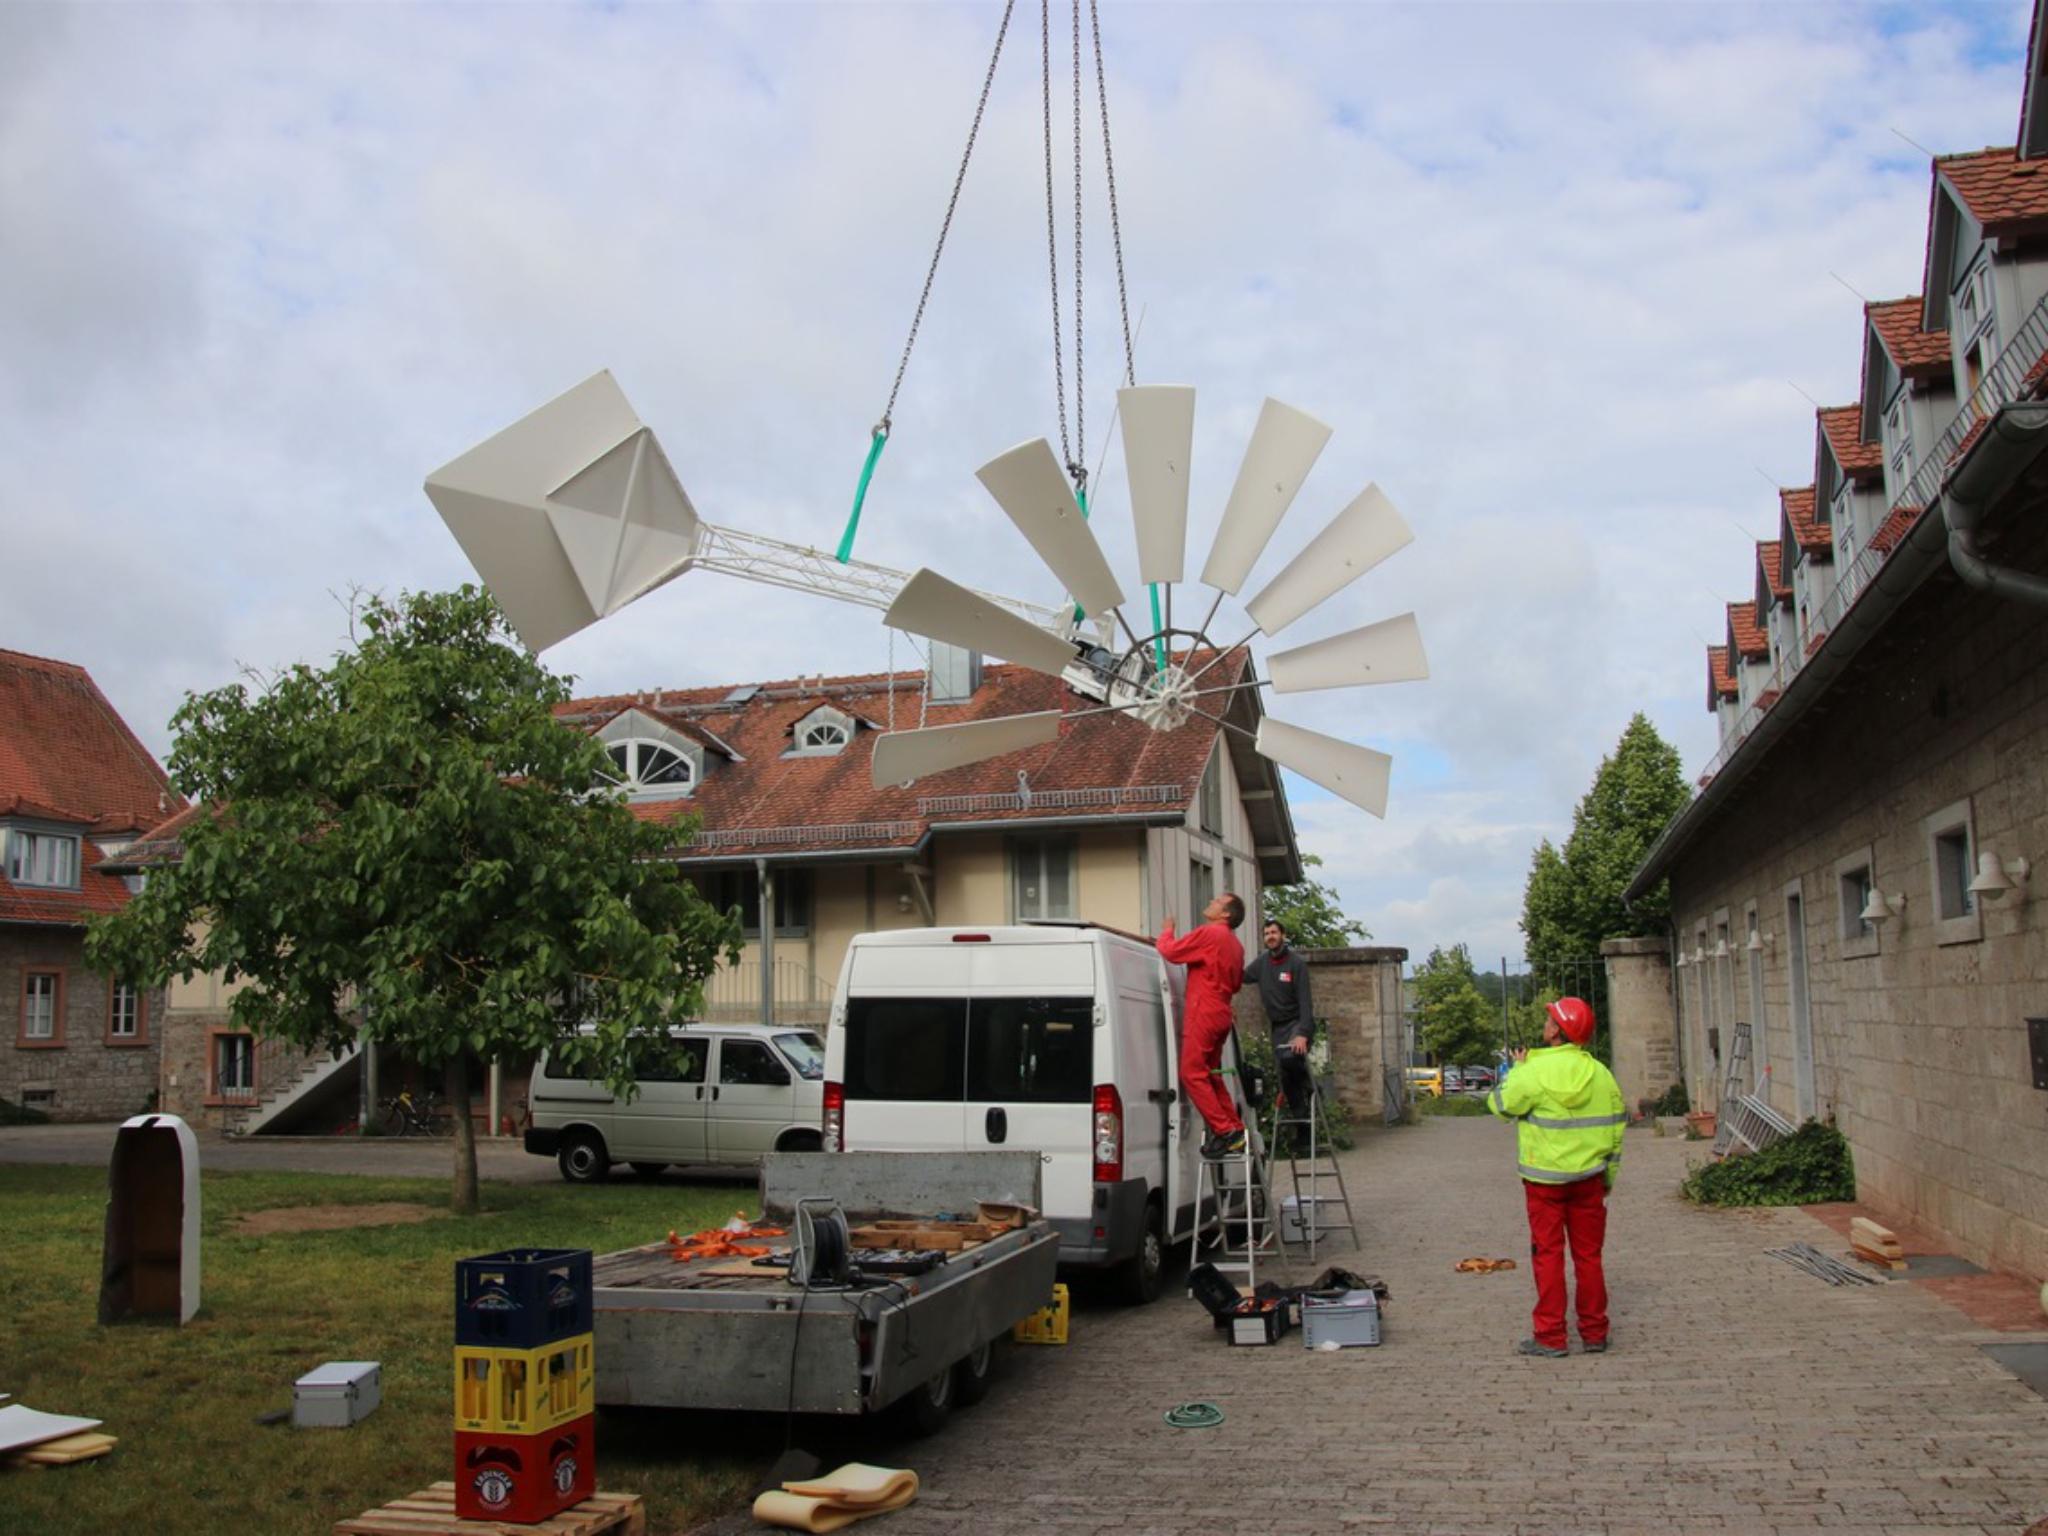 Unterstützung der Fa. Riedel Bau beim Aufbau. Foto: Jugendbegegnungshaus Windrad e.V. / Dominik Großmann